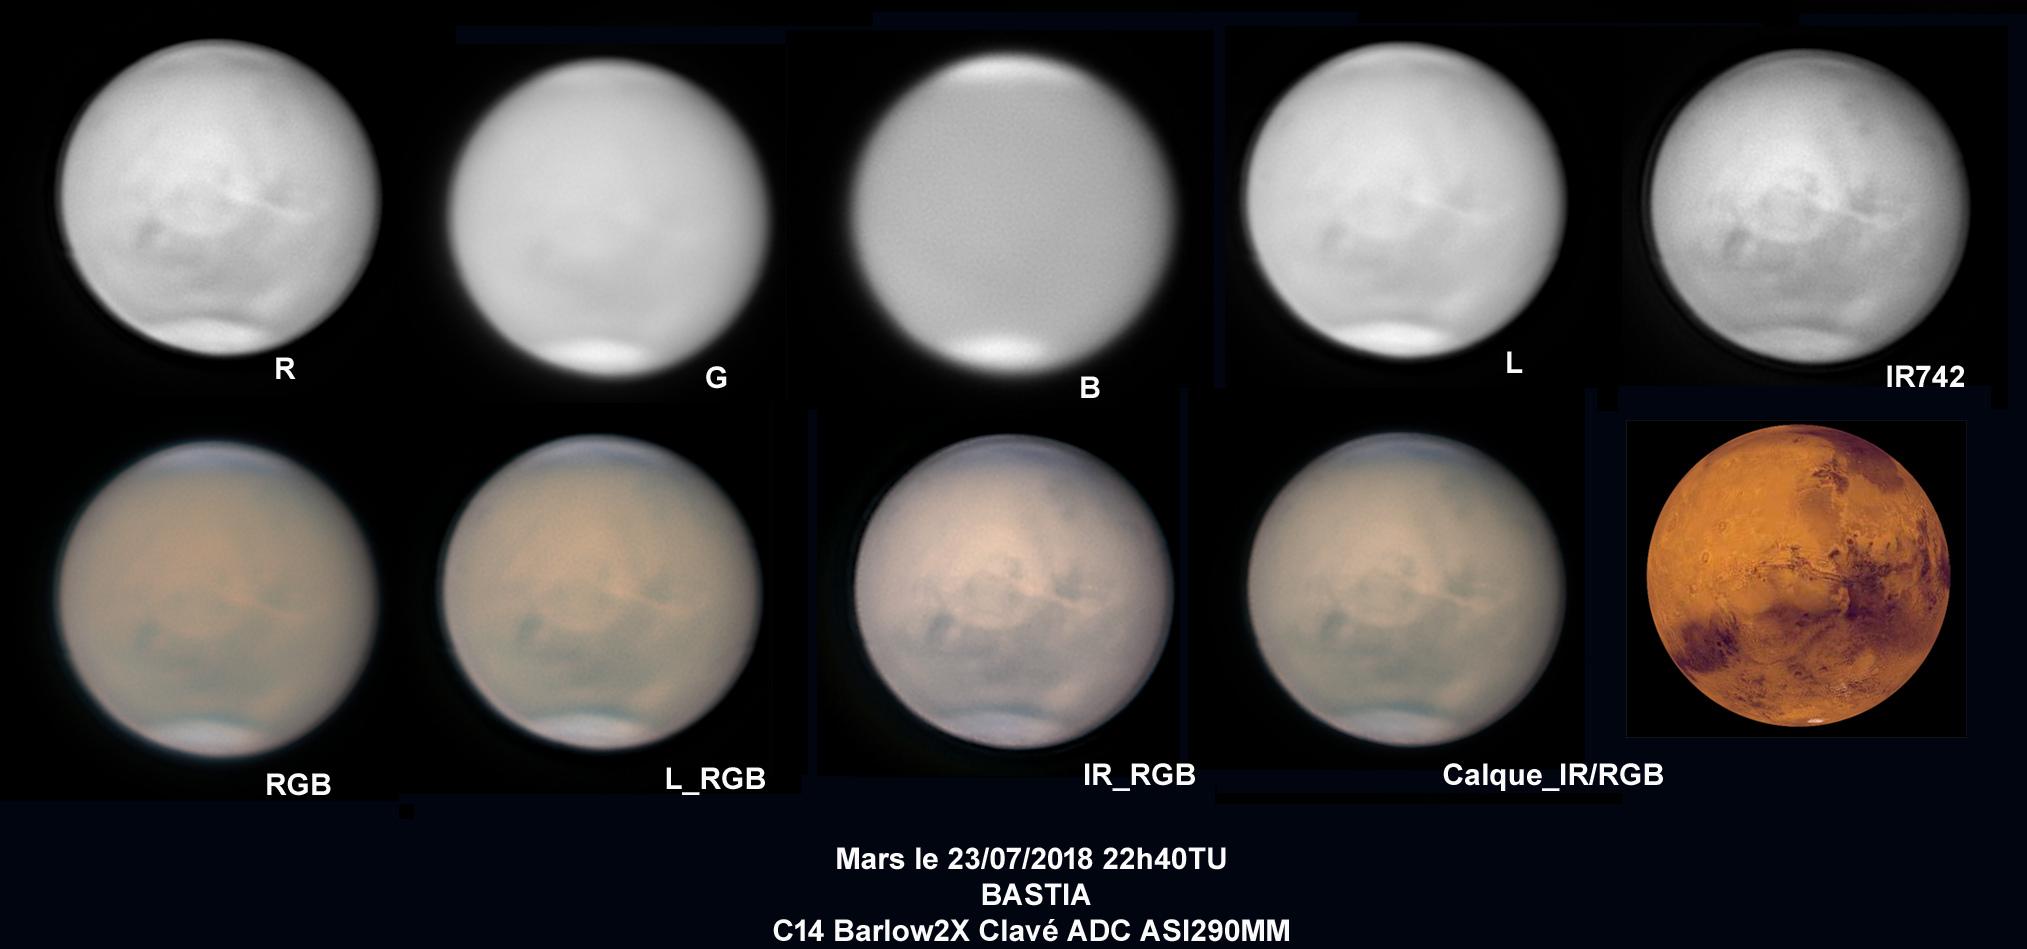 Mars_23_07_2018_22_40_PLANC.jpg